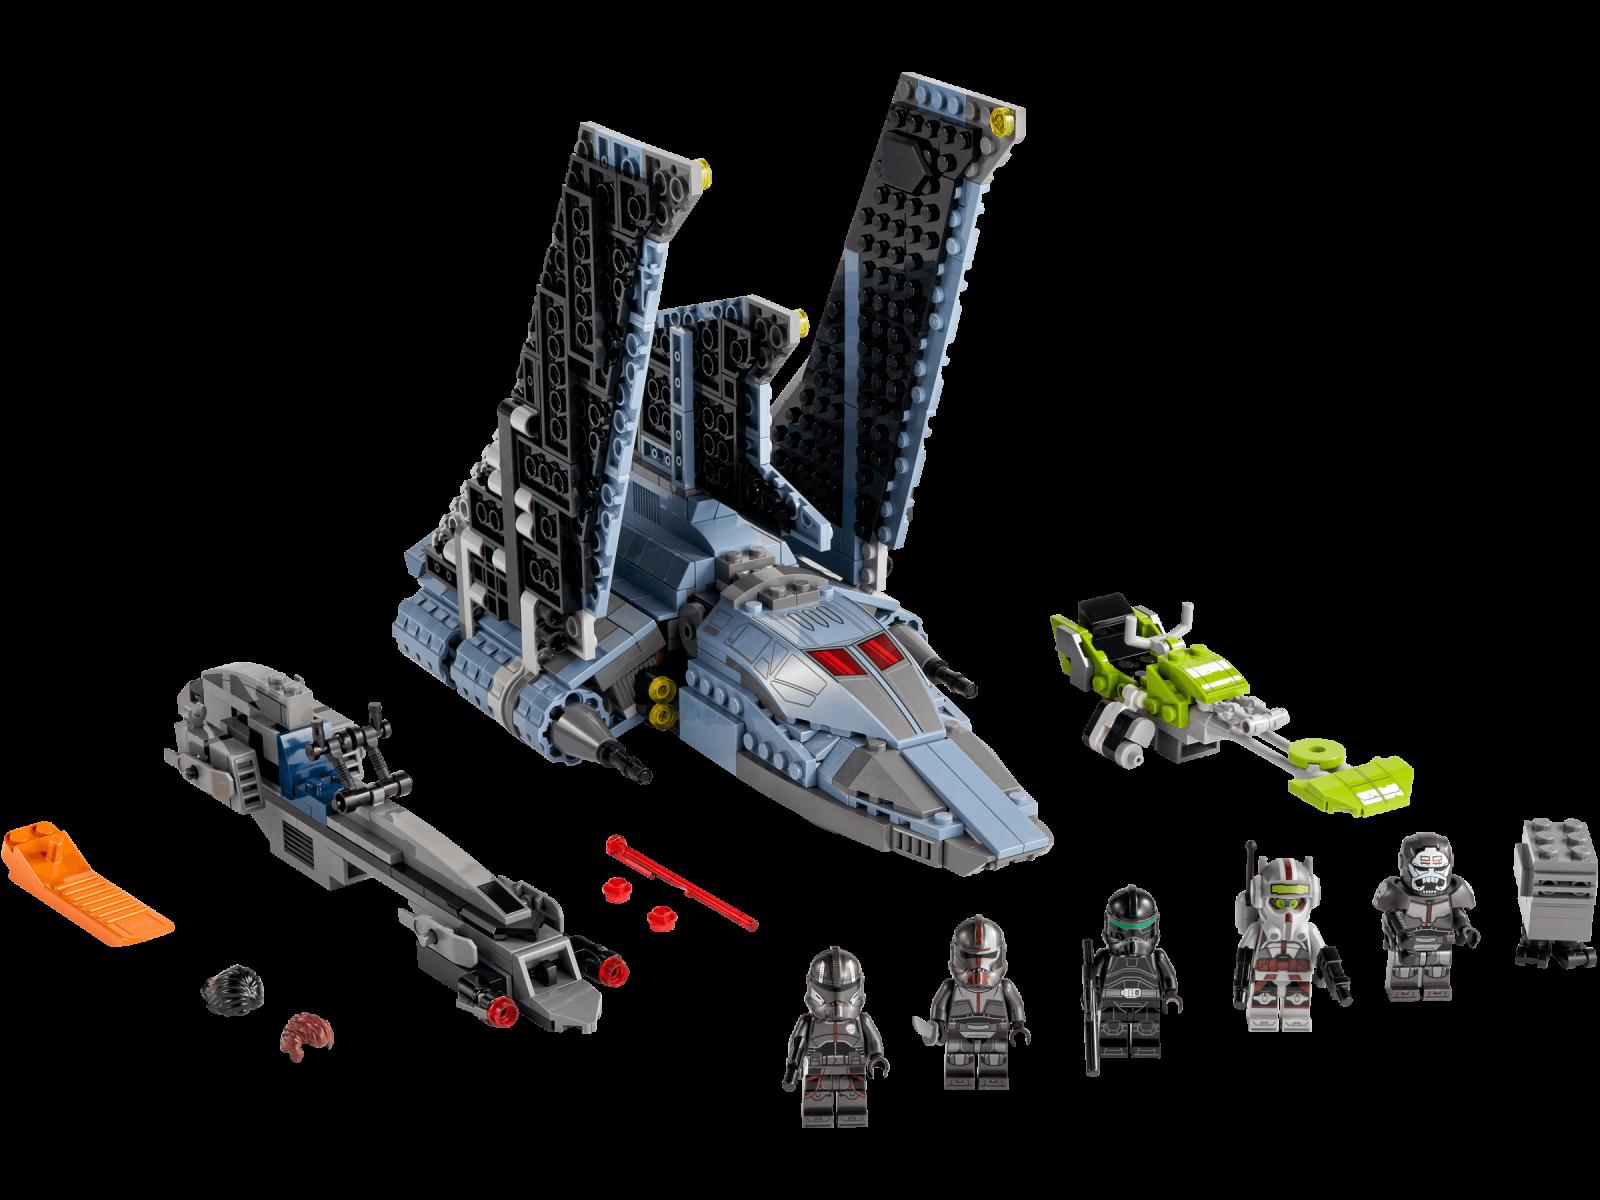 LEGO The Bad Batch™ Attack Shuttle